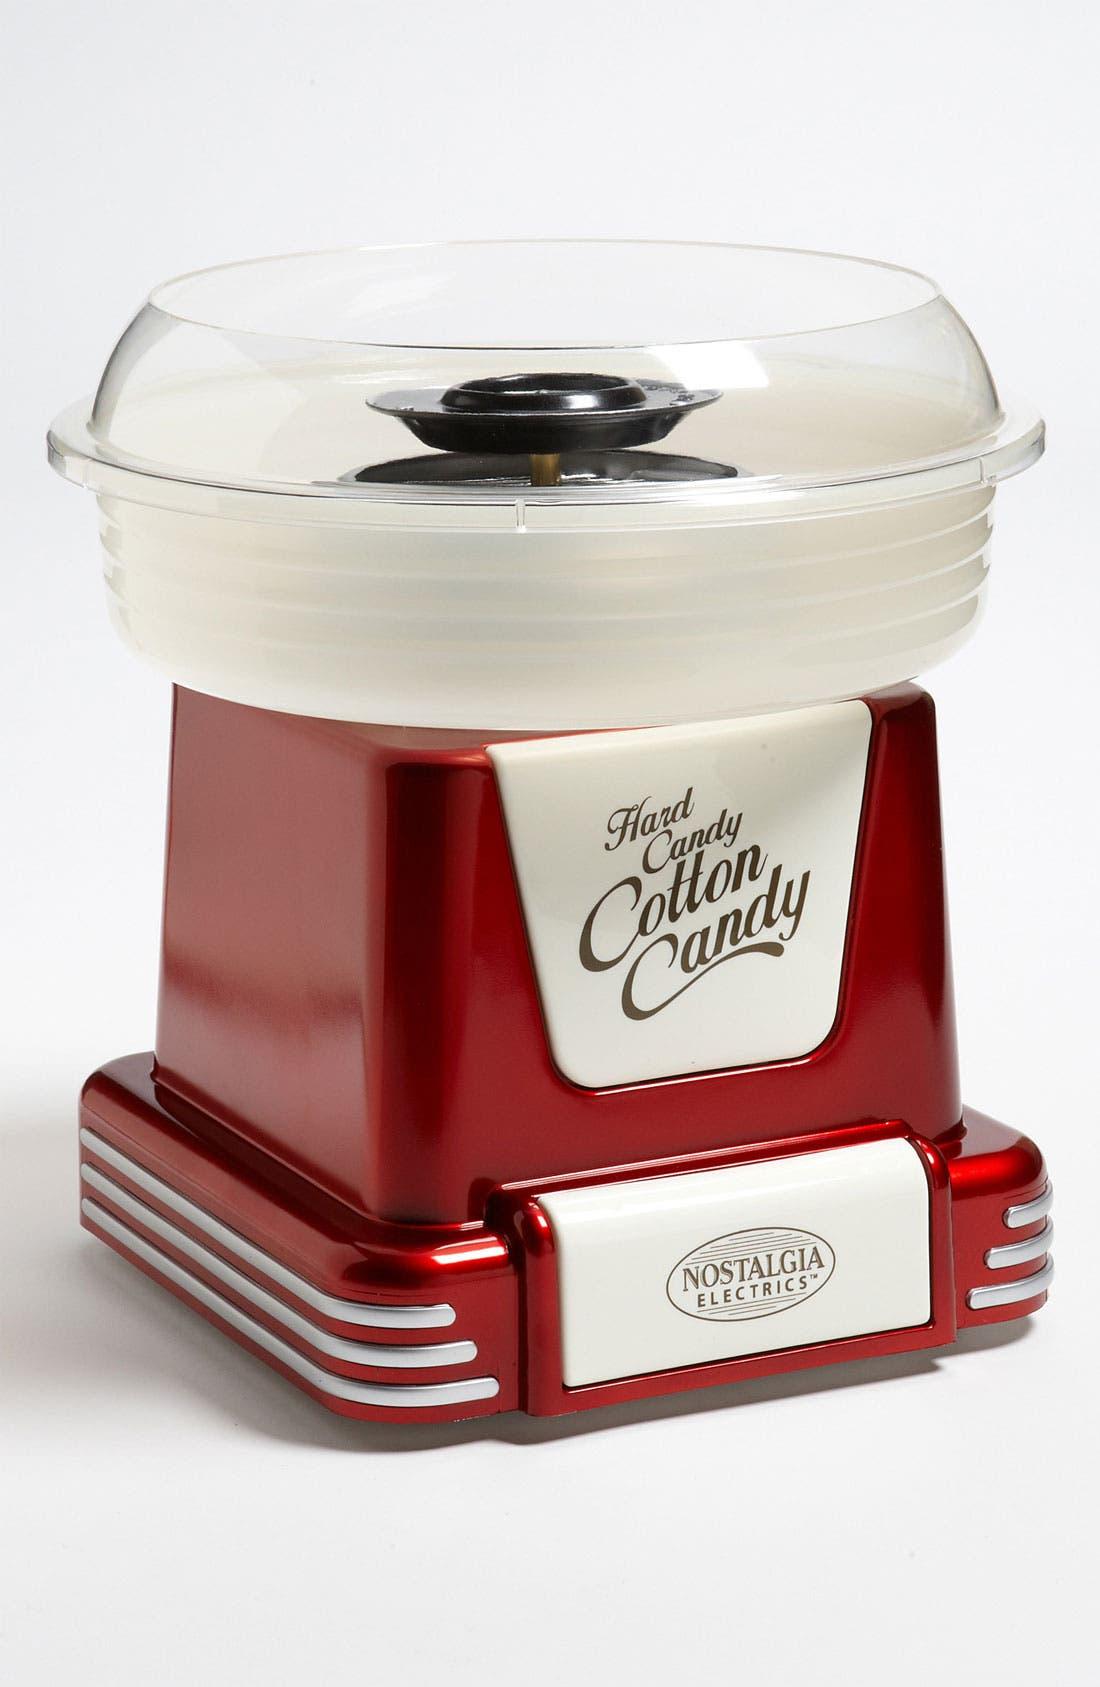 Main Image - 'Retro Series' Cotton Candy Maker